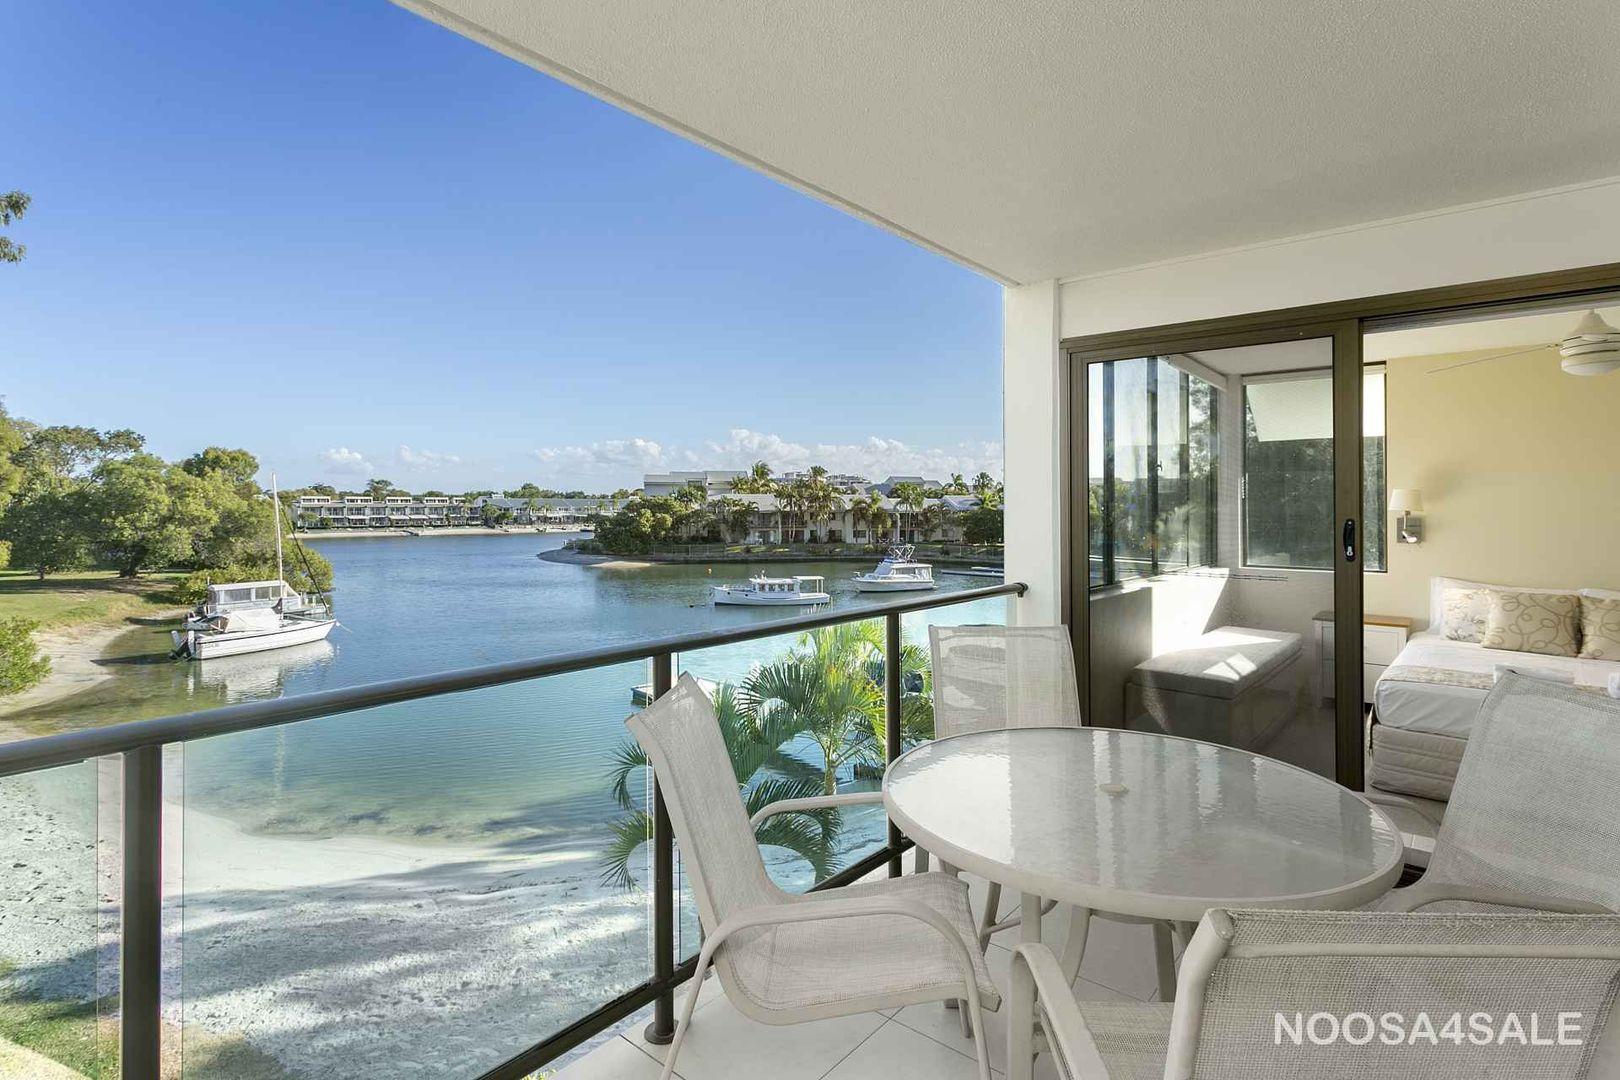 20/1 Quamby Place, Noosa Heads QLD 4567, Image 2